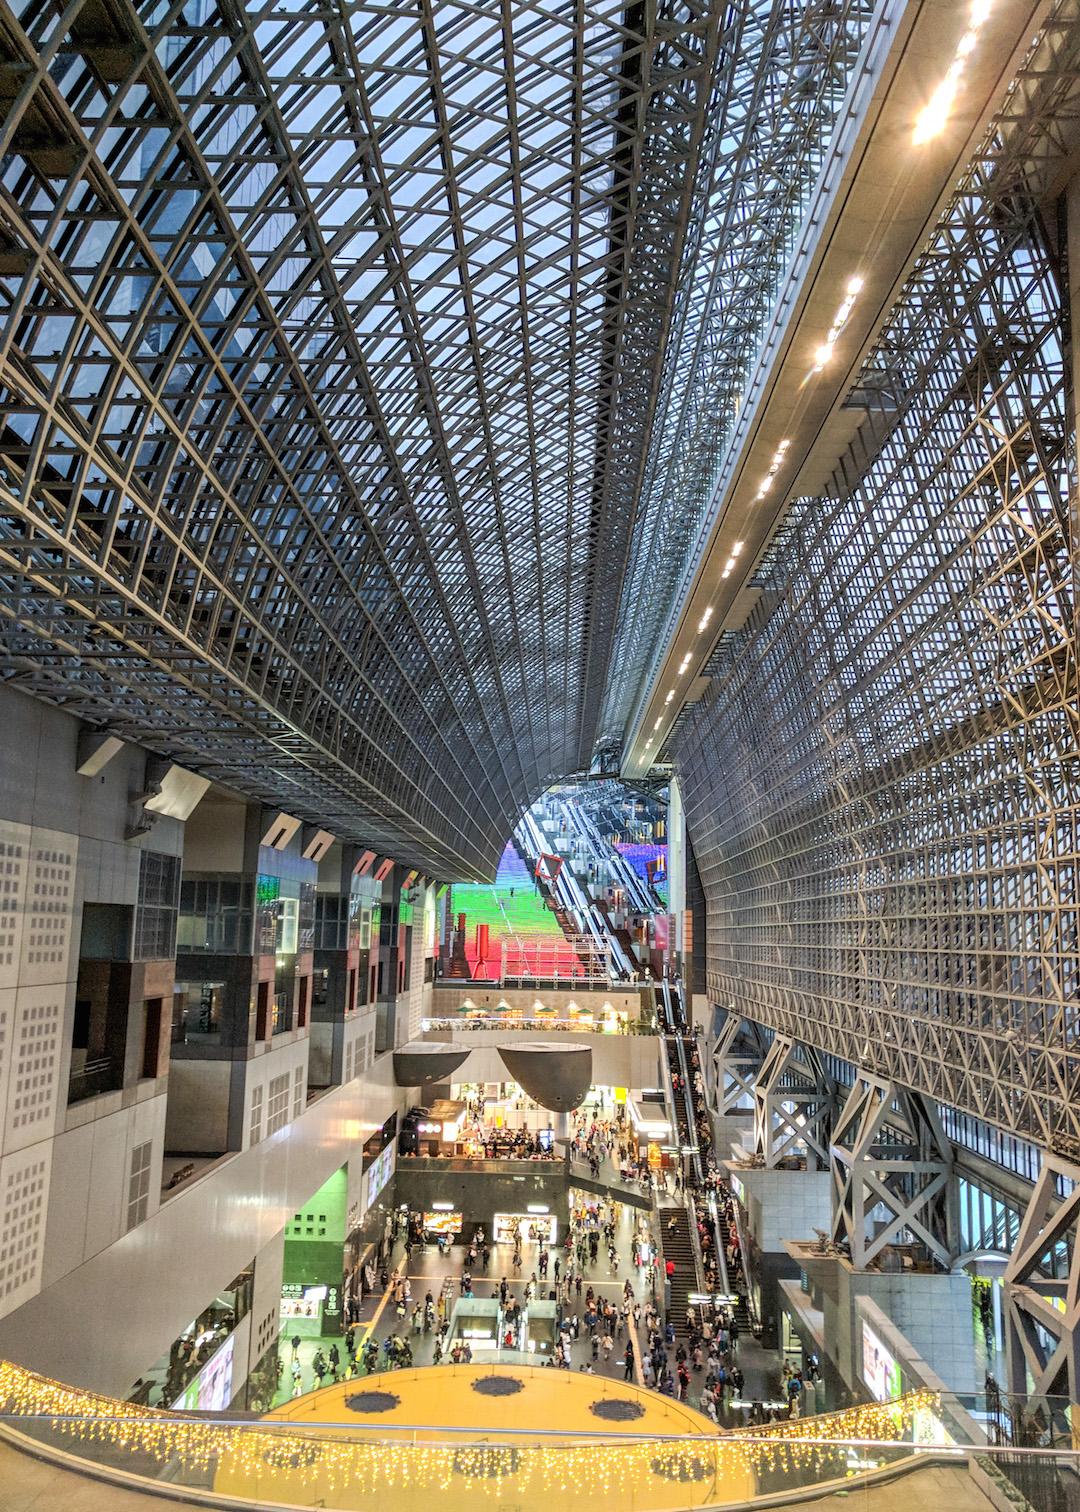 Her_Travel_Edit_Kyoto_Station_Interior